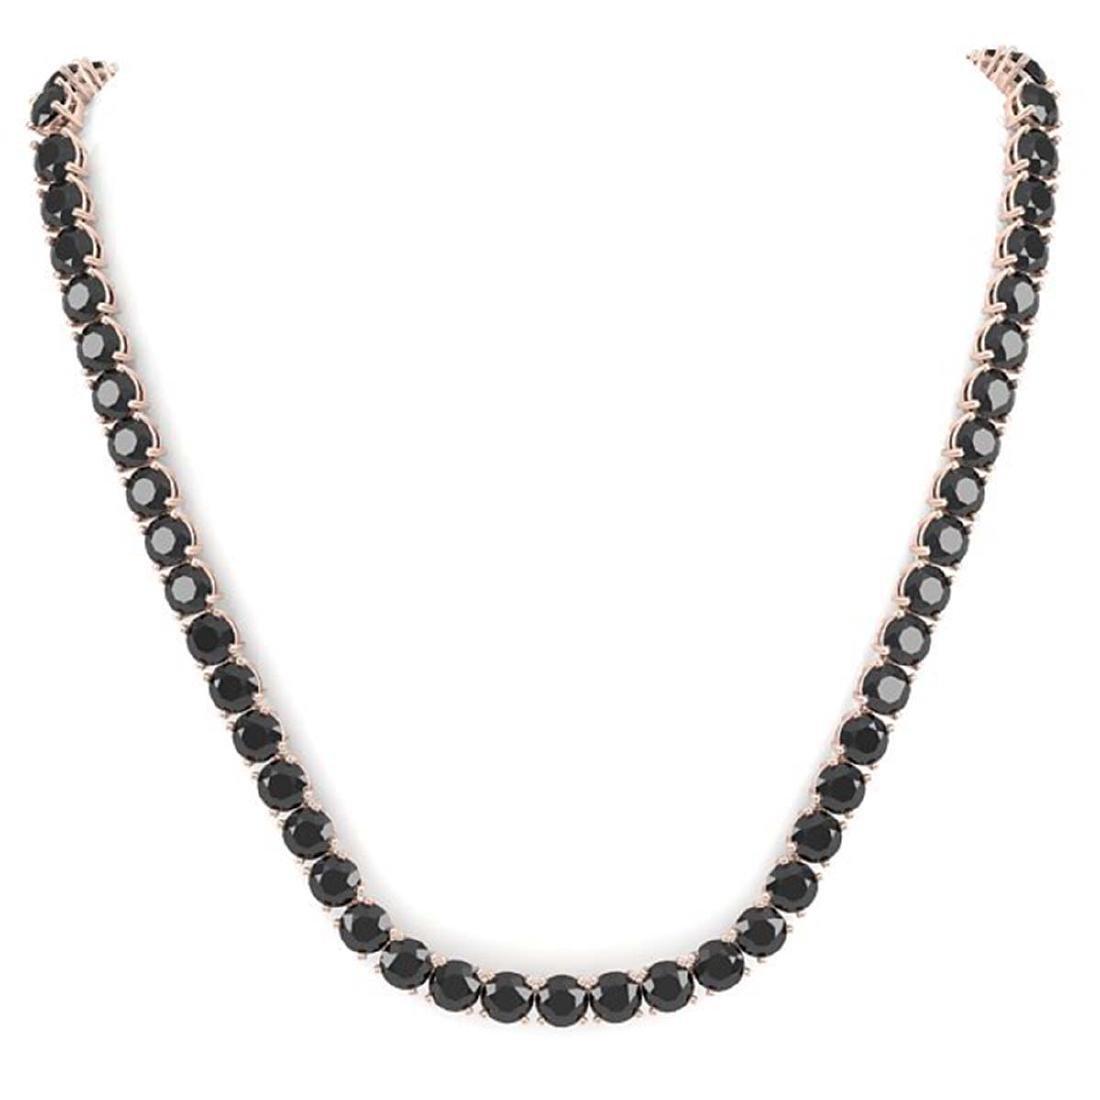 40 CTW Certified Black VS Diamond Necklace 14K Rose - 3